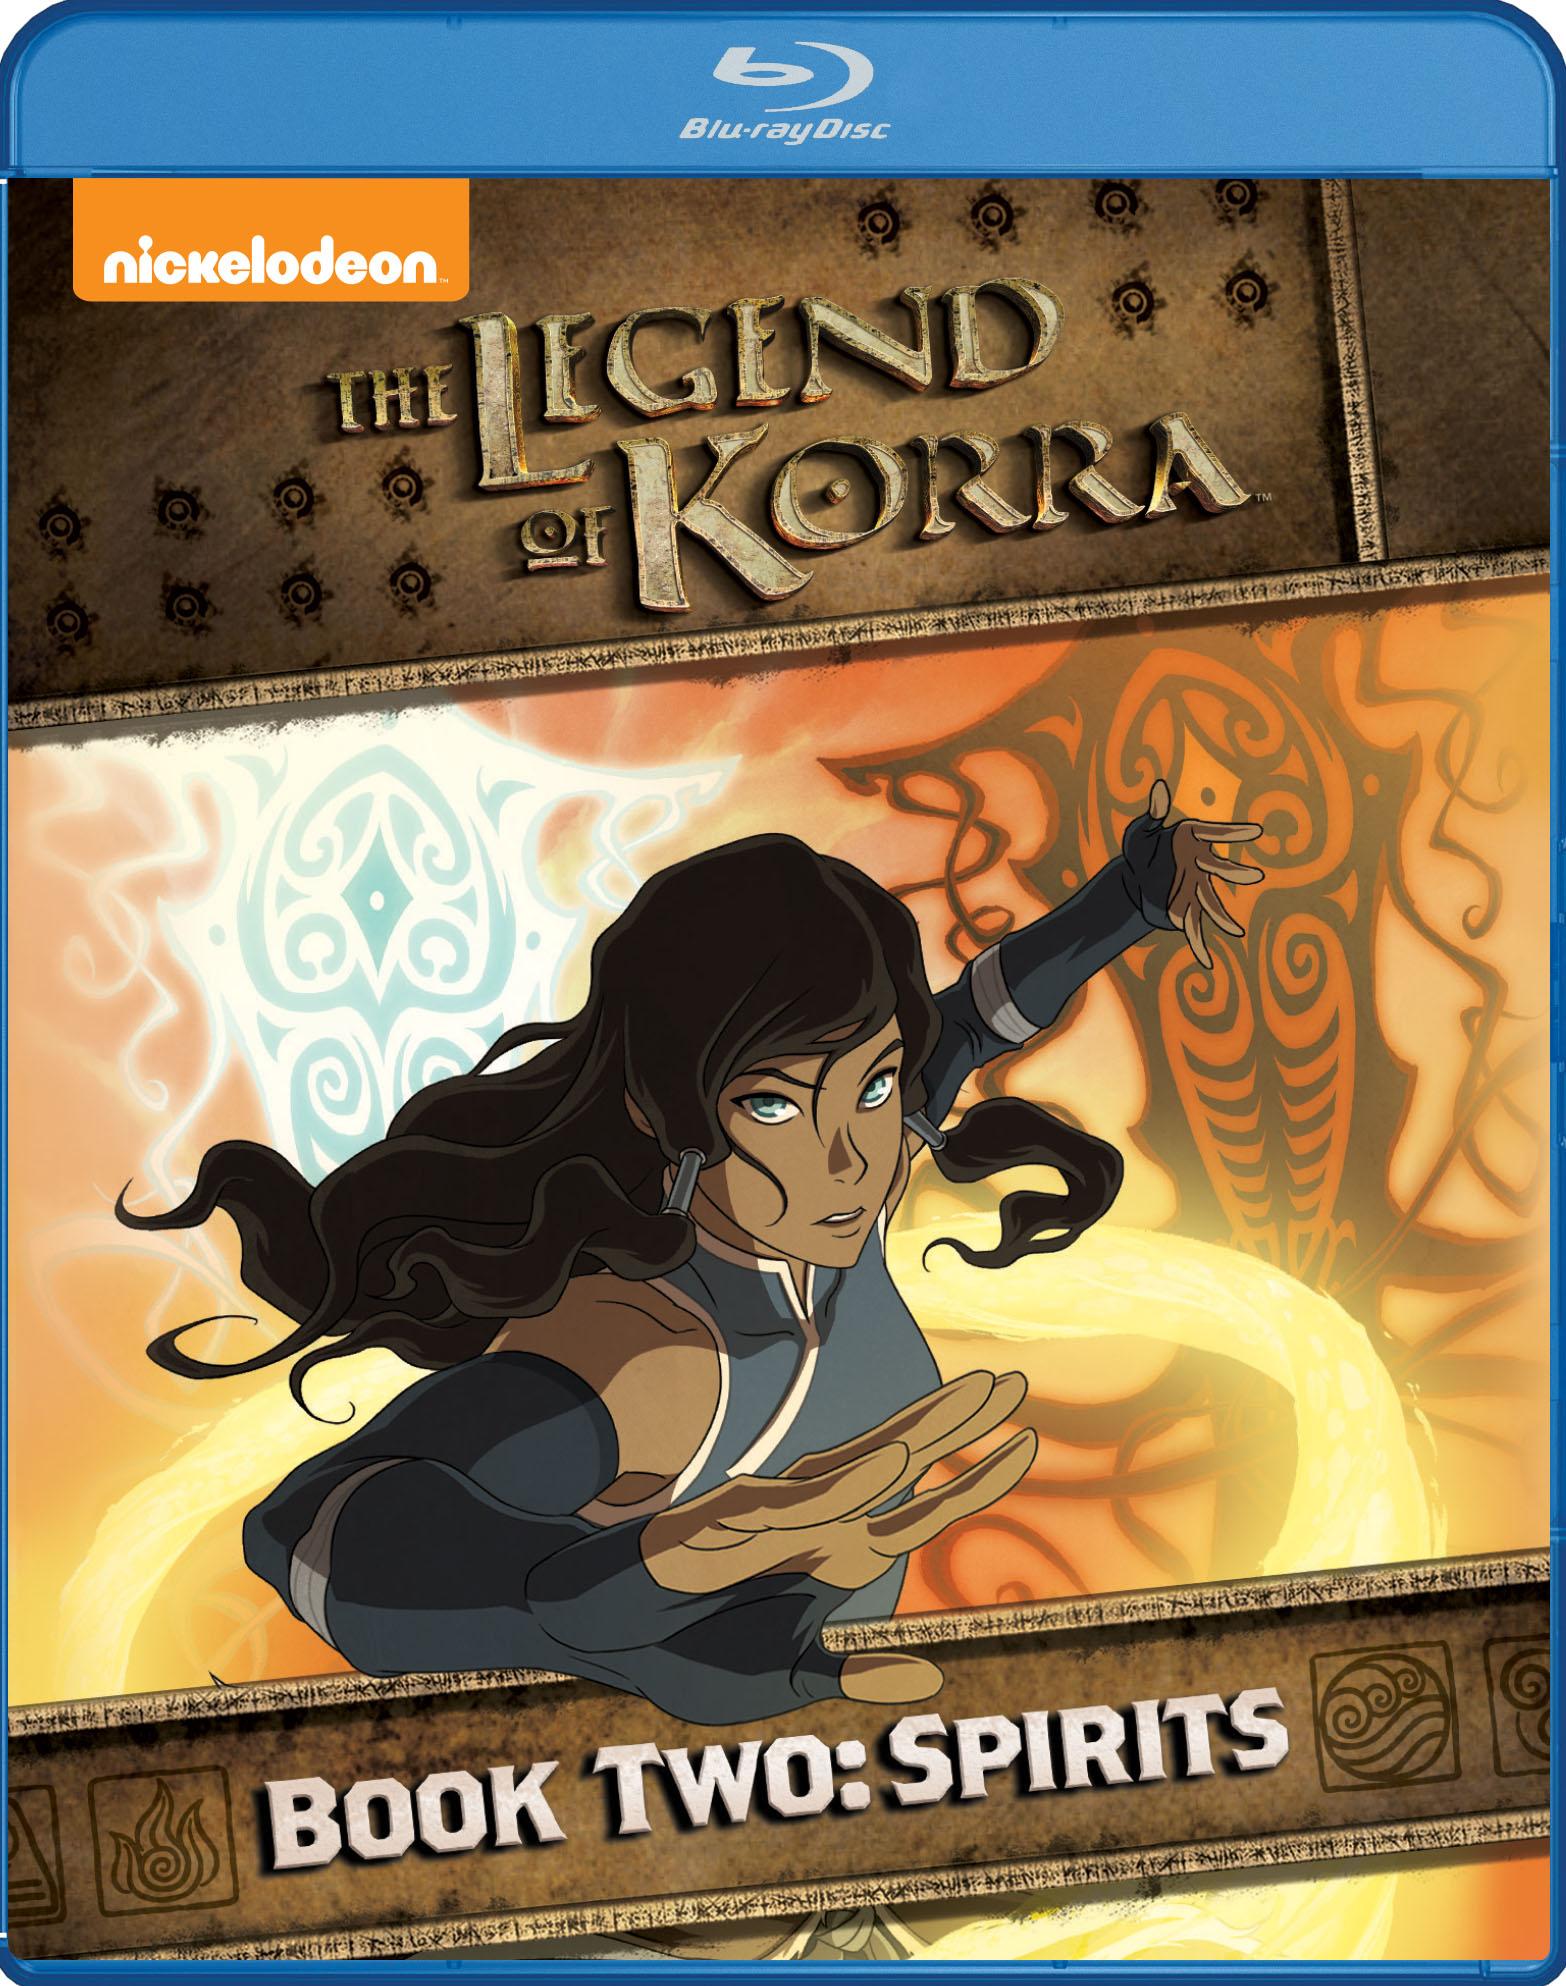 The Legend Of Korra: Book Two - Spirits [2 Discs] (blu-ray) 6159126